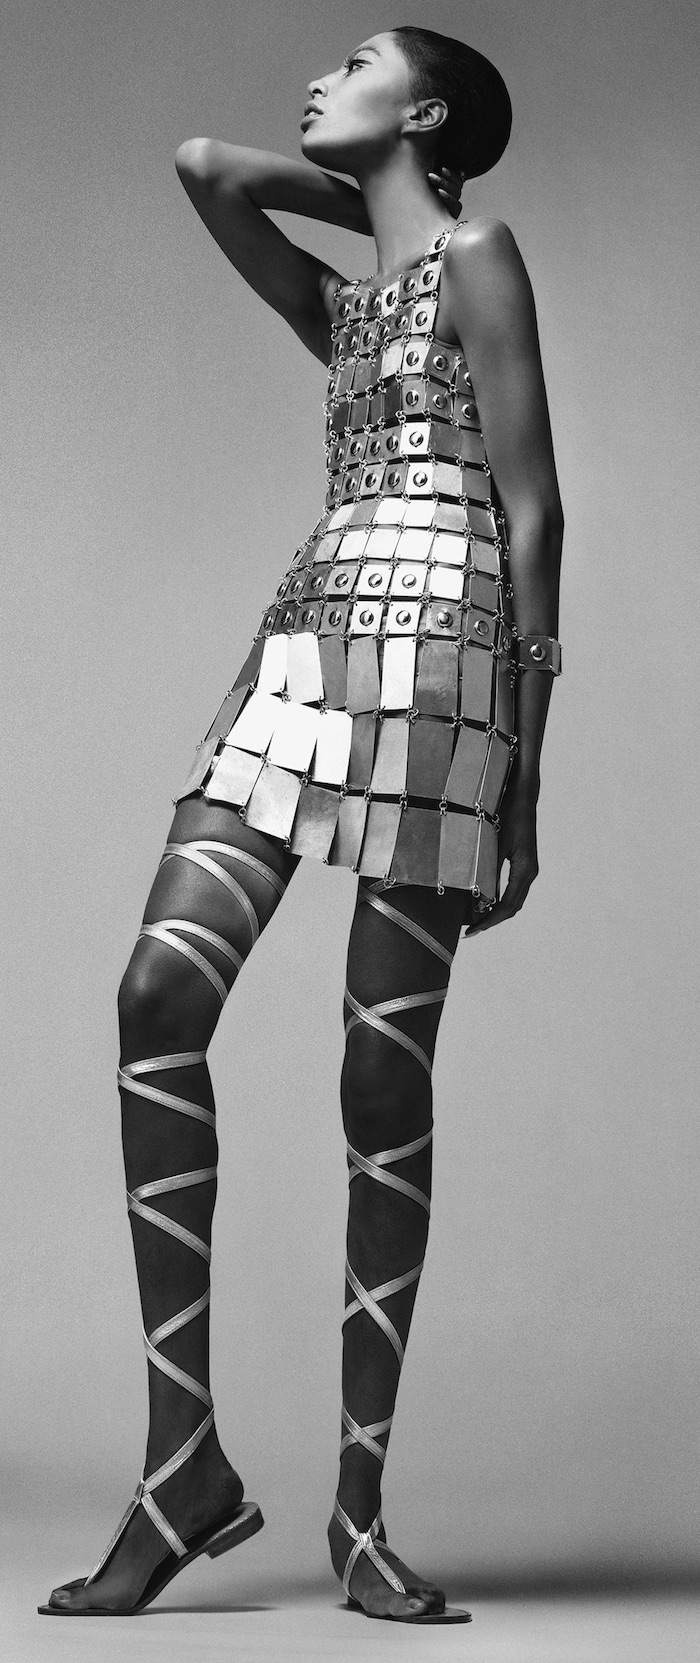 Donyale Luna, dress by Paco Rabanne, New York, December 6, 1966, by Richard Avedon